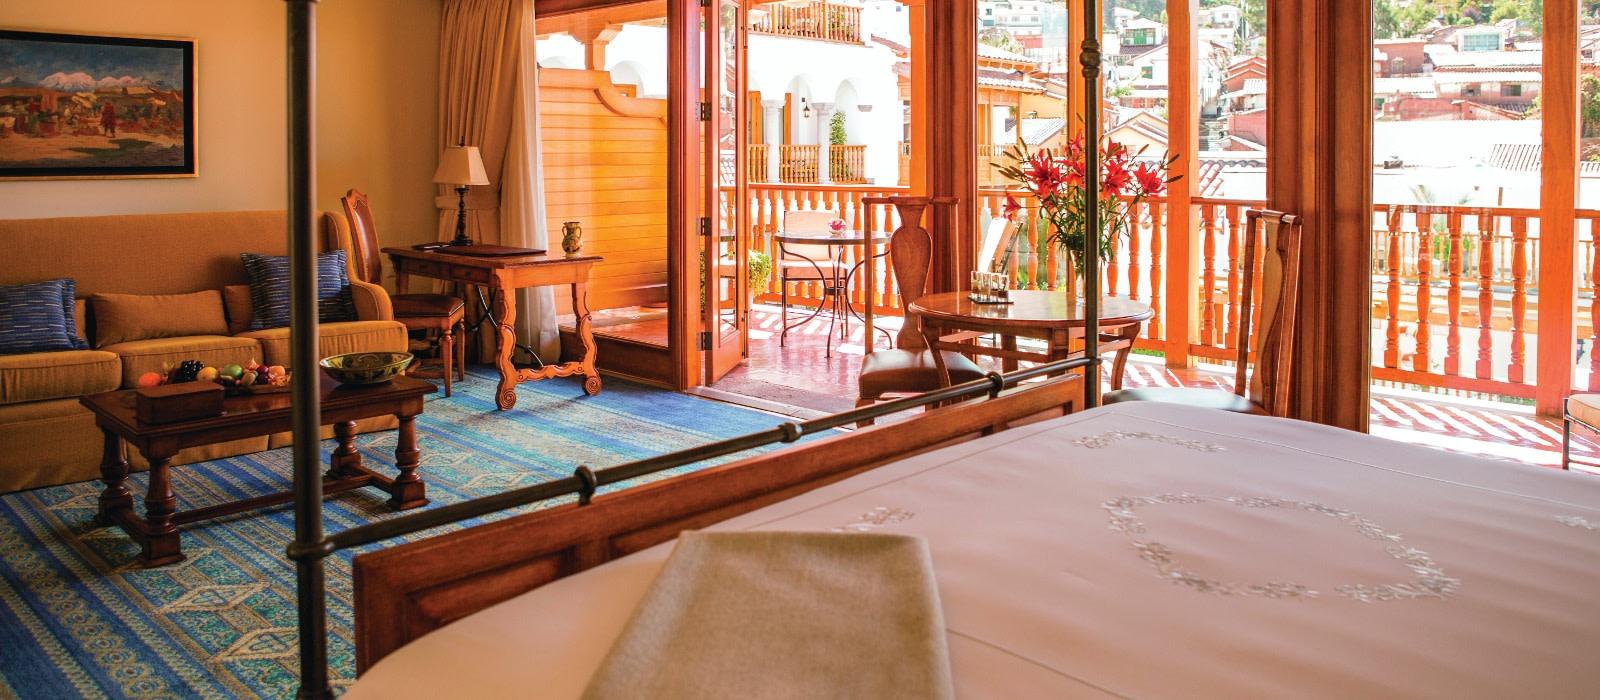 Hotel Belmond Palacio Nazarenas Peru